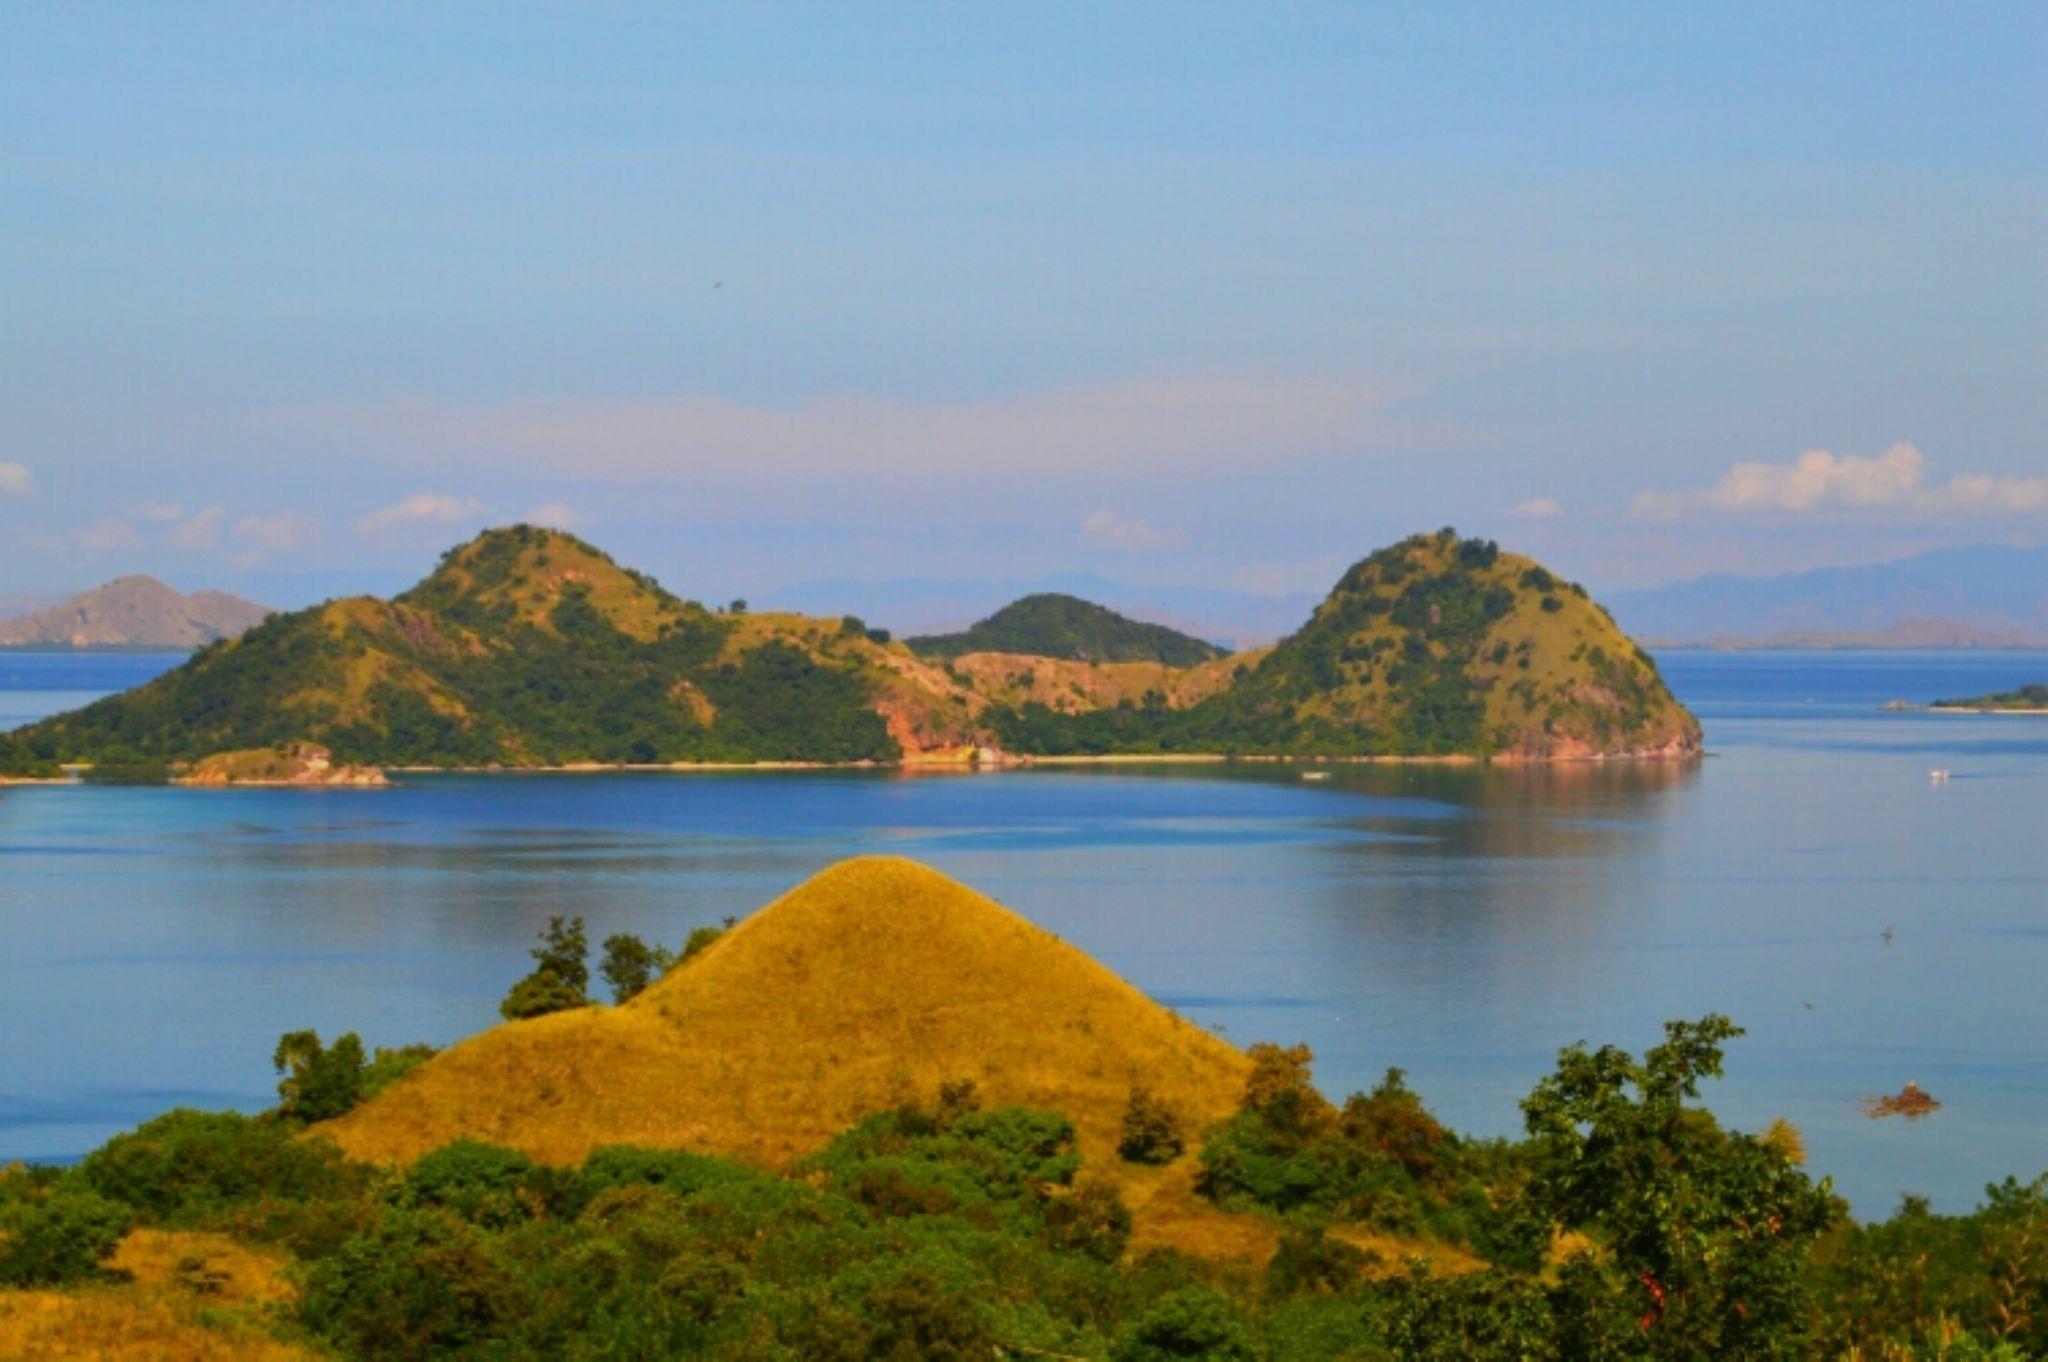 seraya island flores indonesia by rinal.dino1